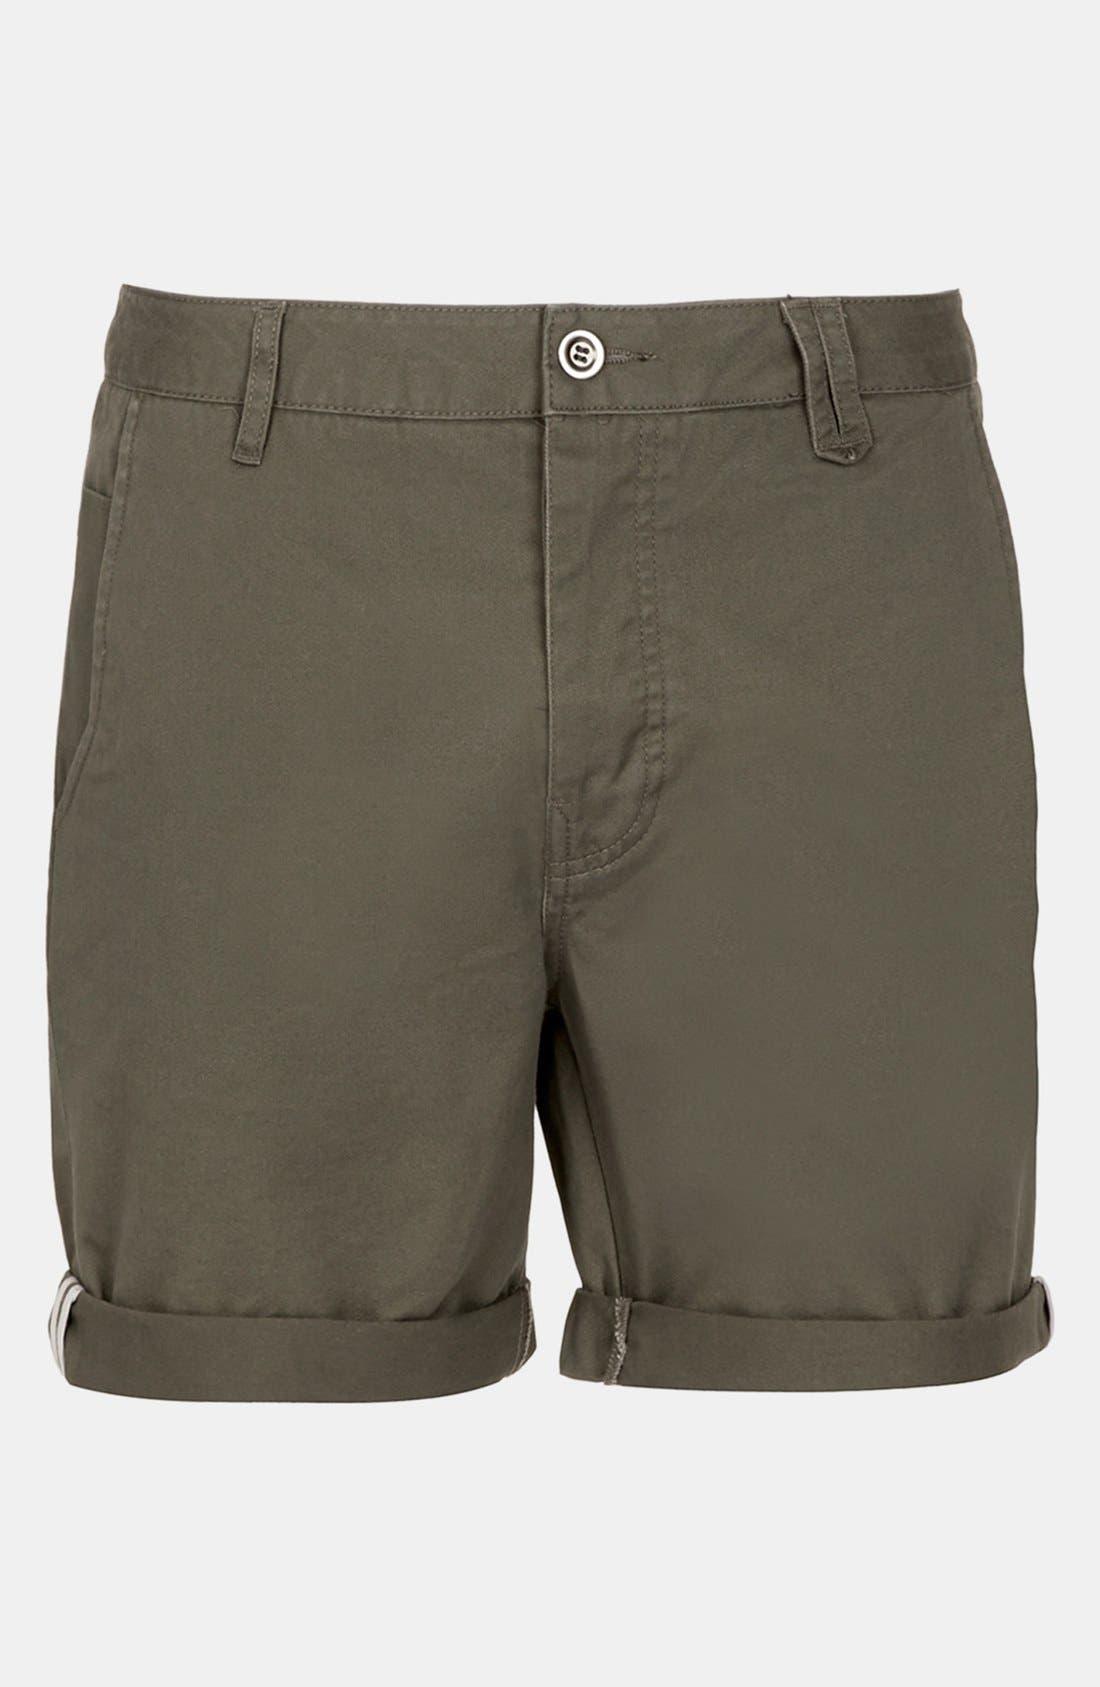 Alternate Image 1 Selected - Topman Cotton Shorts